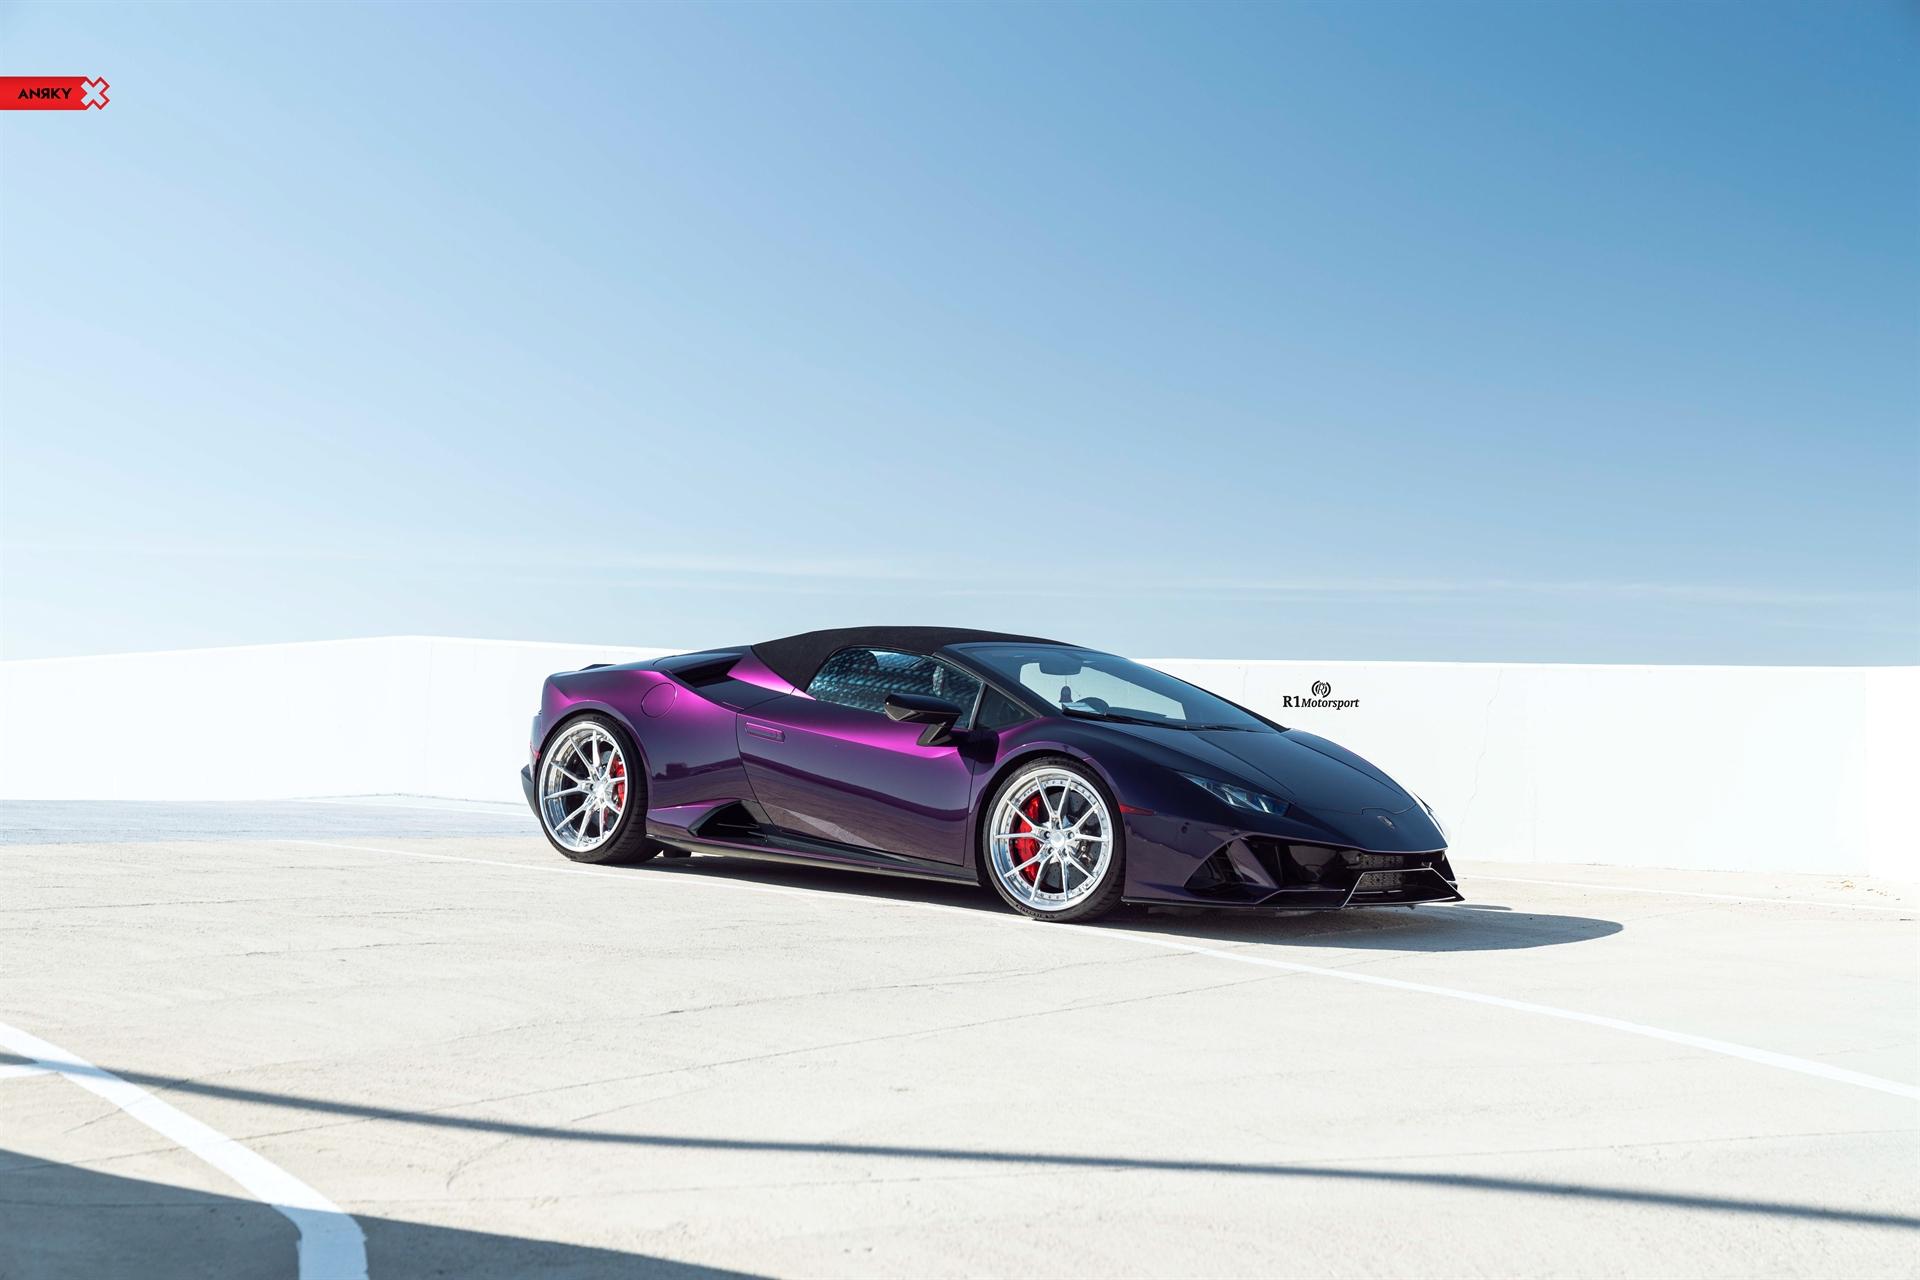 Lamborghini Huracan Evo Spyder – AN32 SeriesTHREE